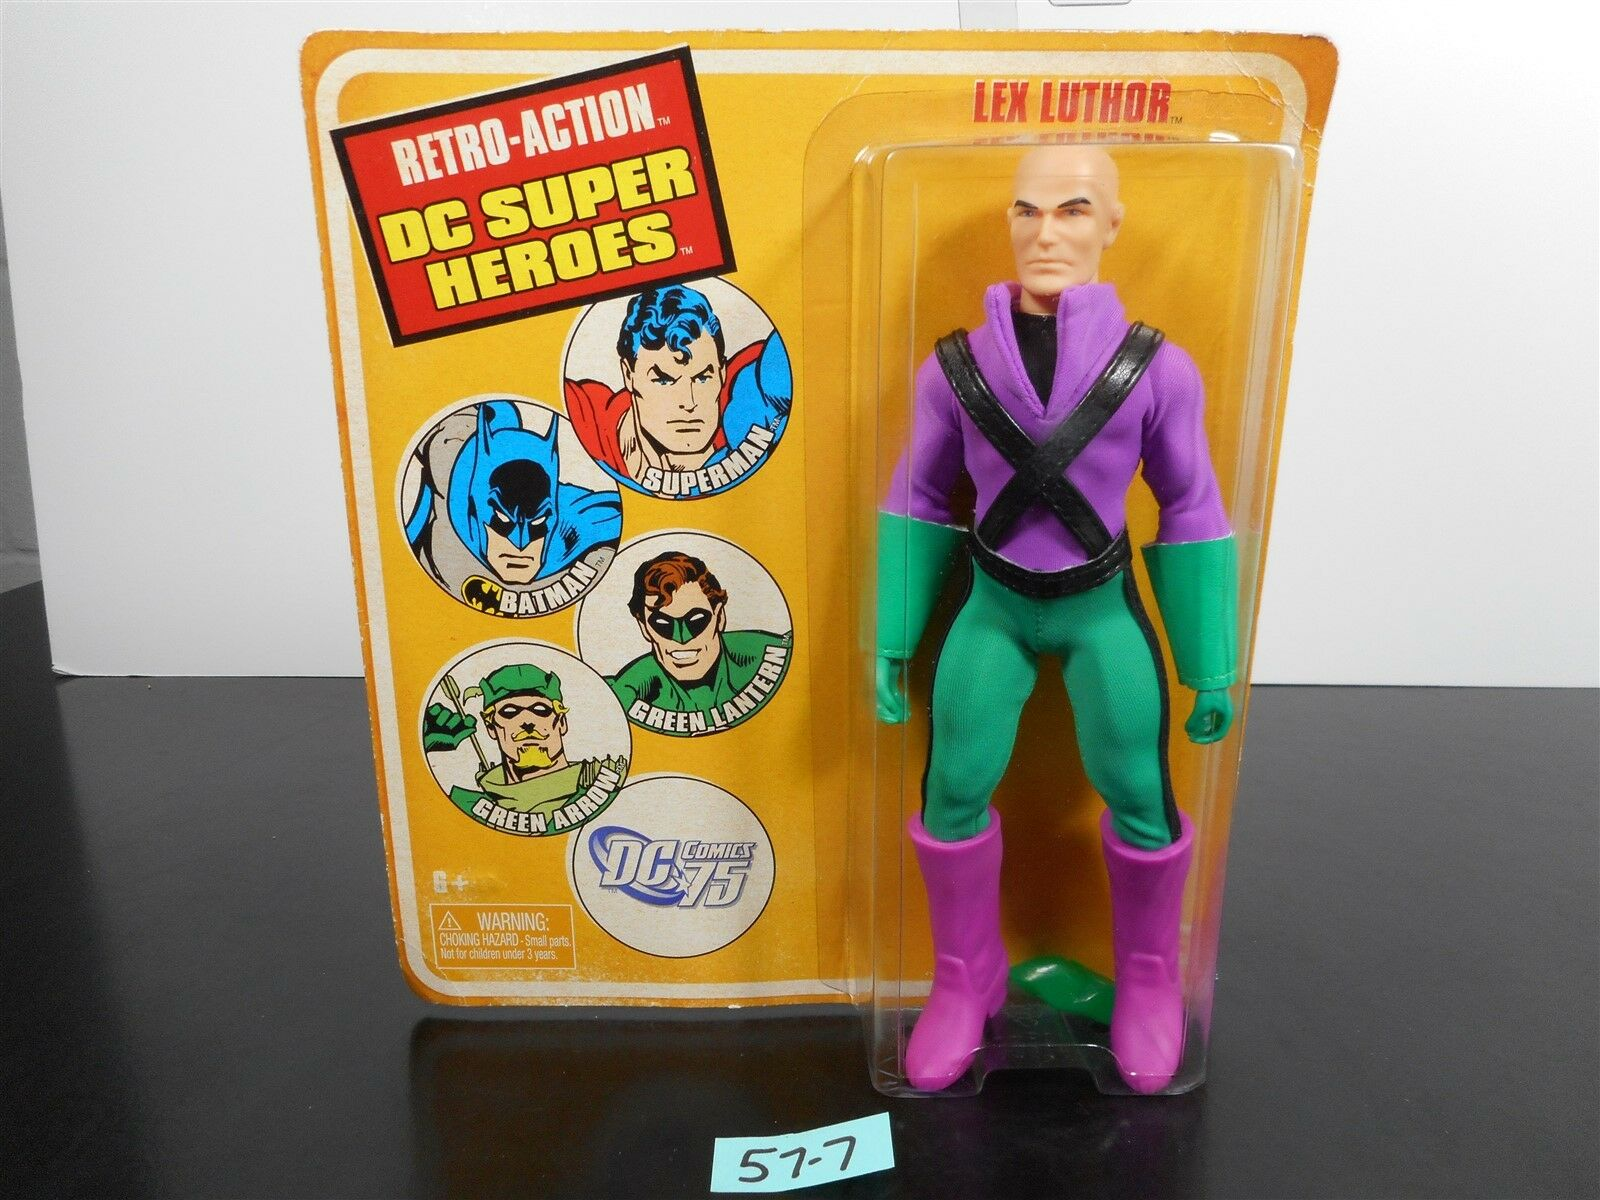 NEW & SEALED   RETRO-ACTION DC SUPER HEROES LEX LUTHOR DC COMICS 75 R5934   57-7